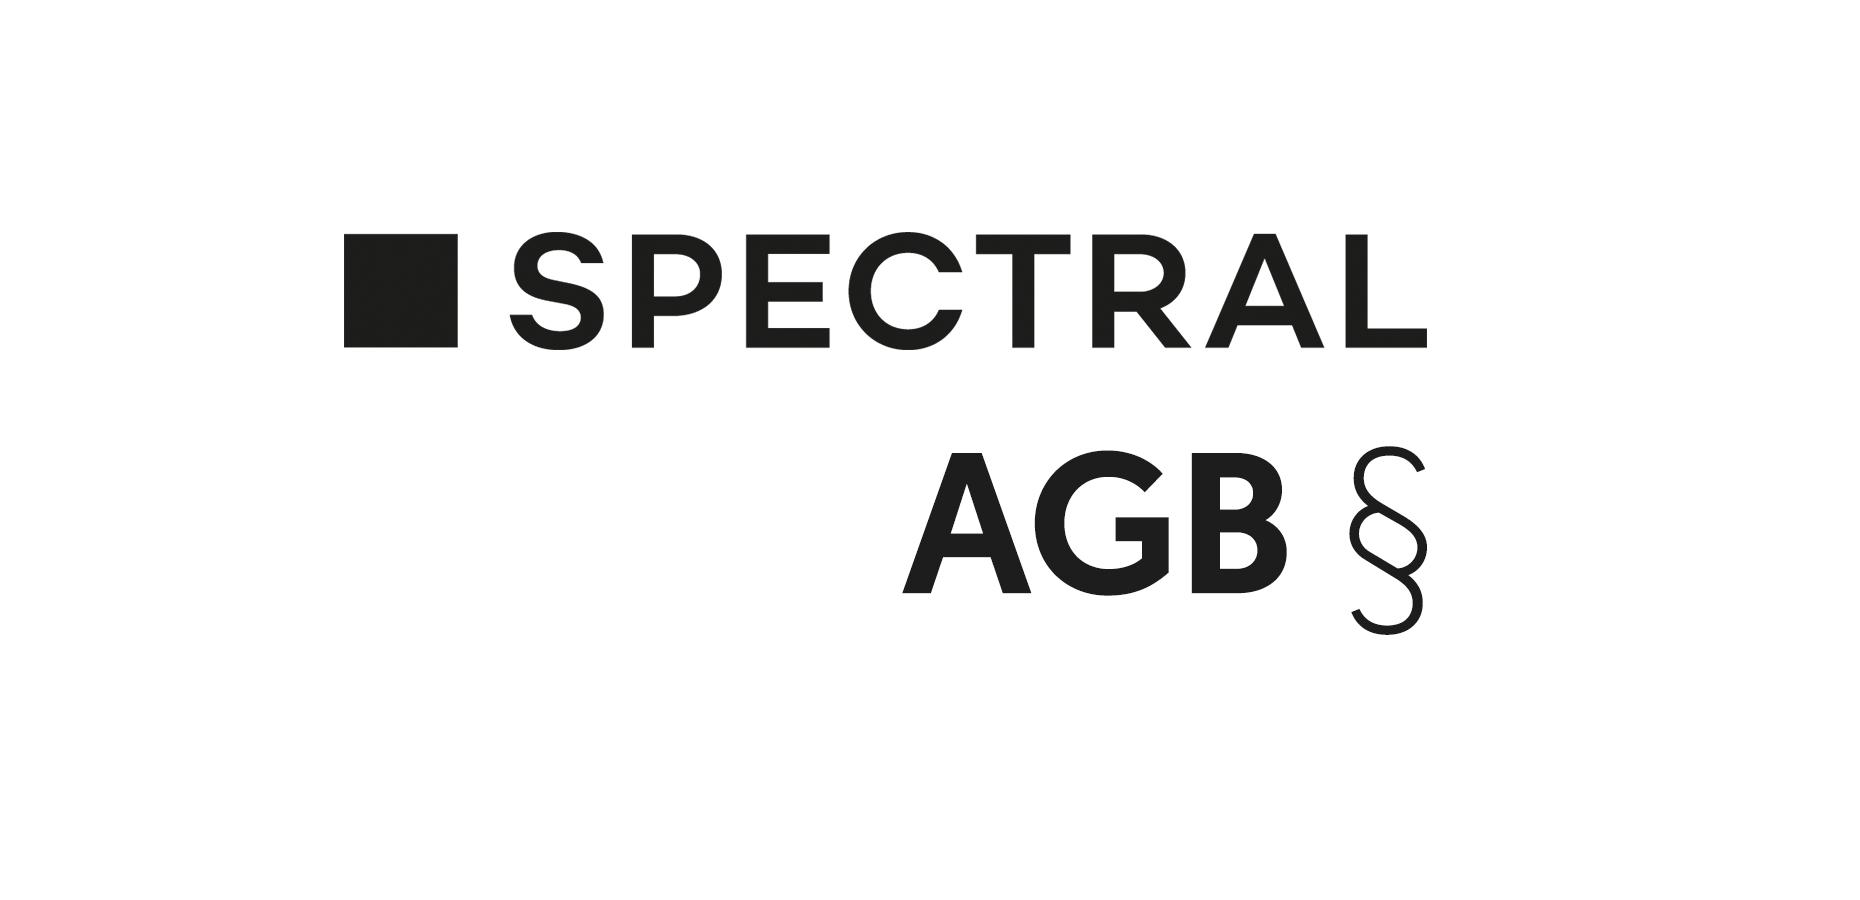 Agb Spectral Audio Möbel Gmbh